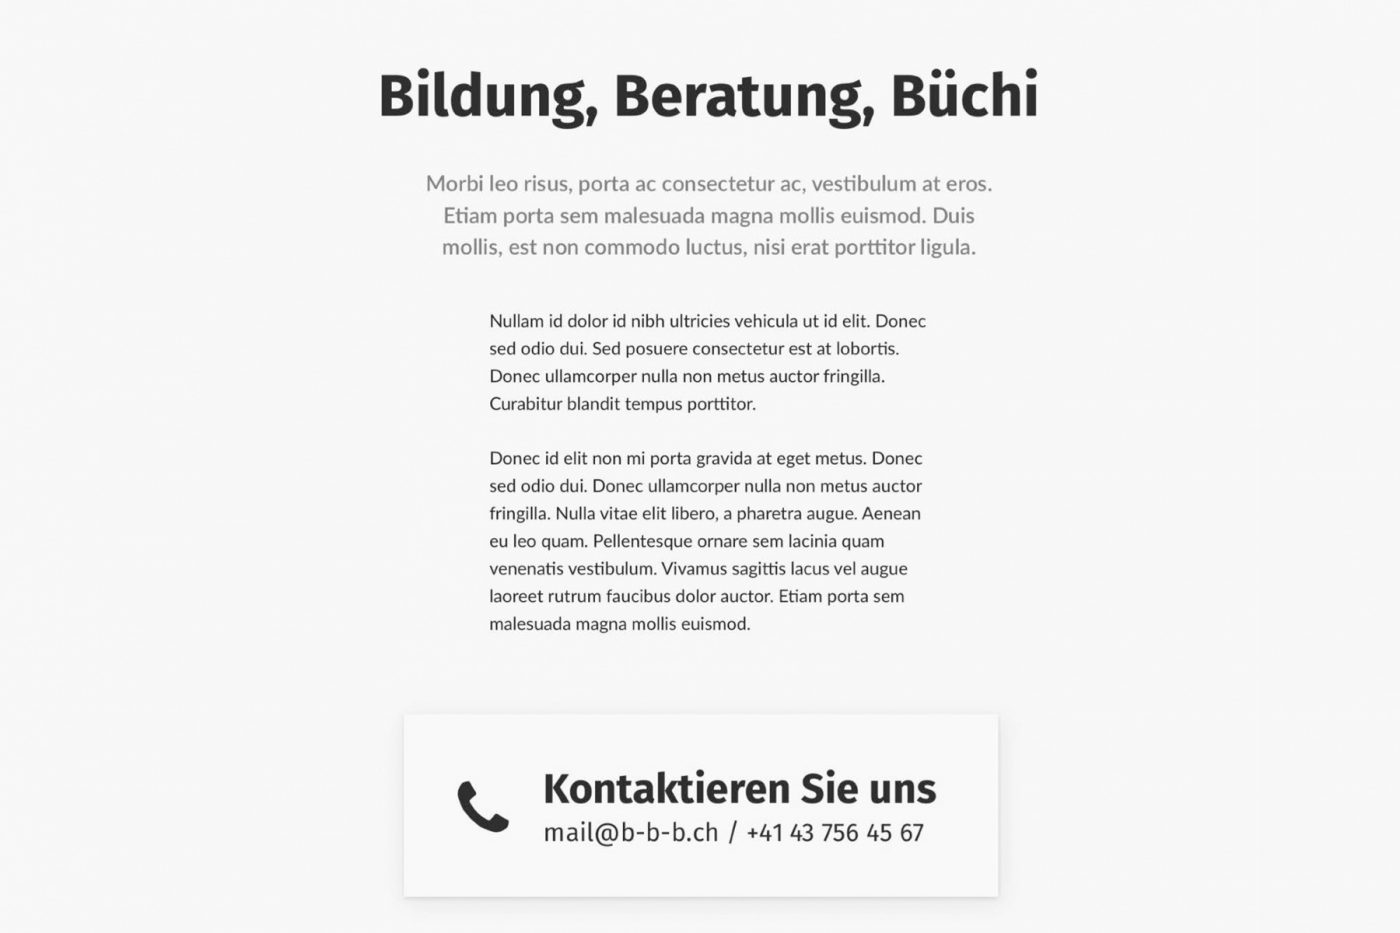 Screenshot for: Bildung, Beratung, Büchi